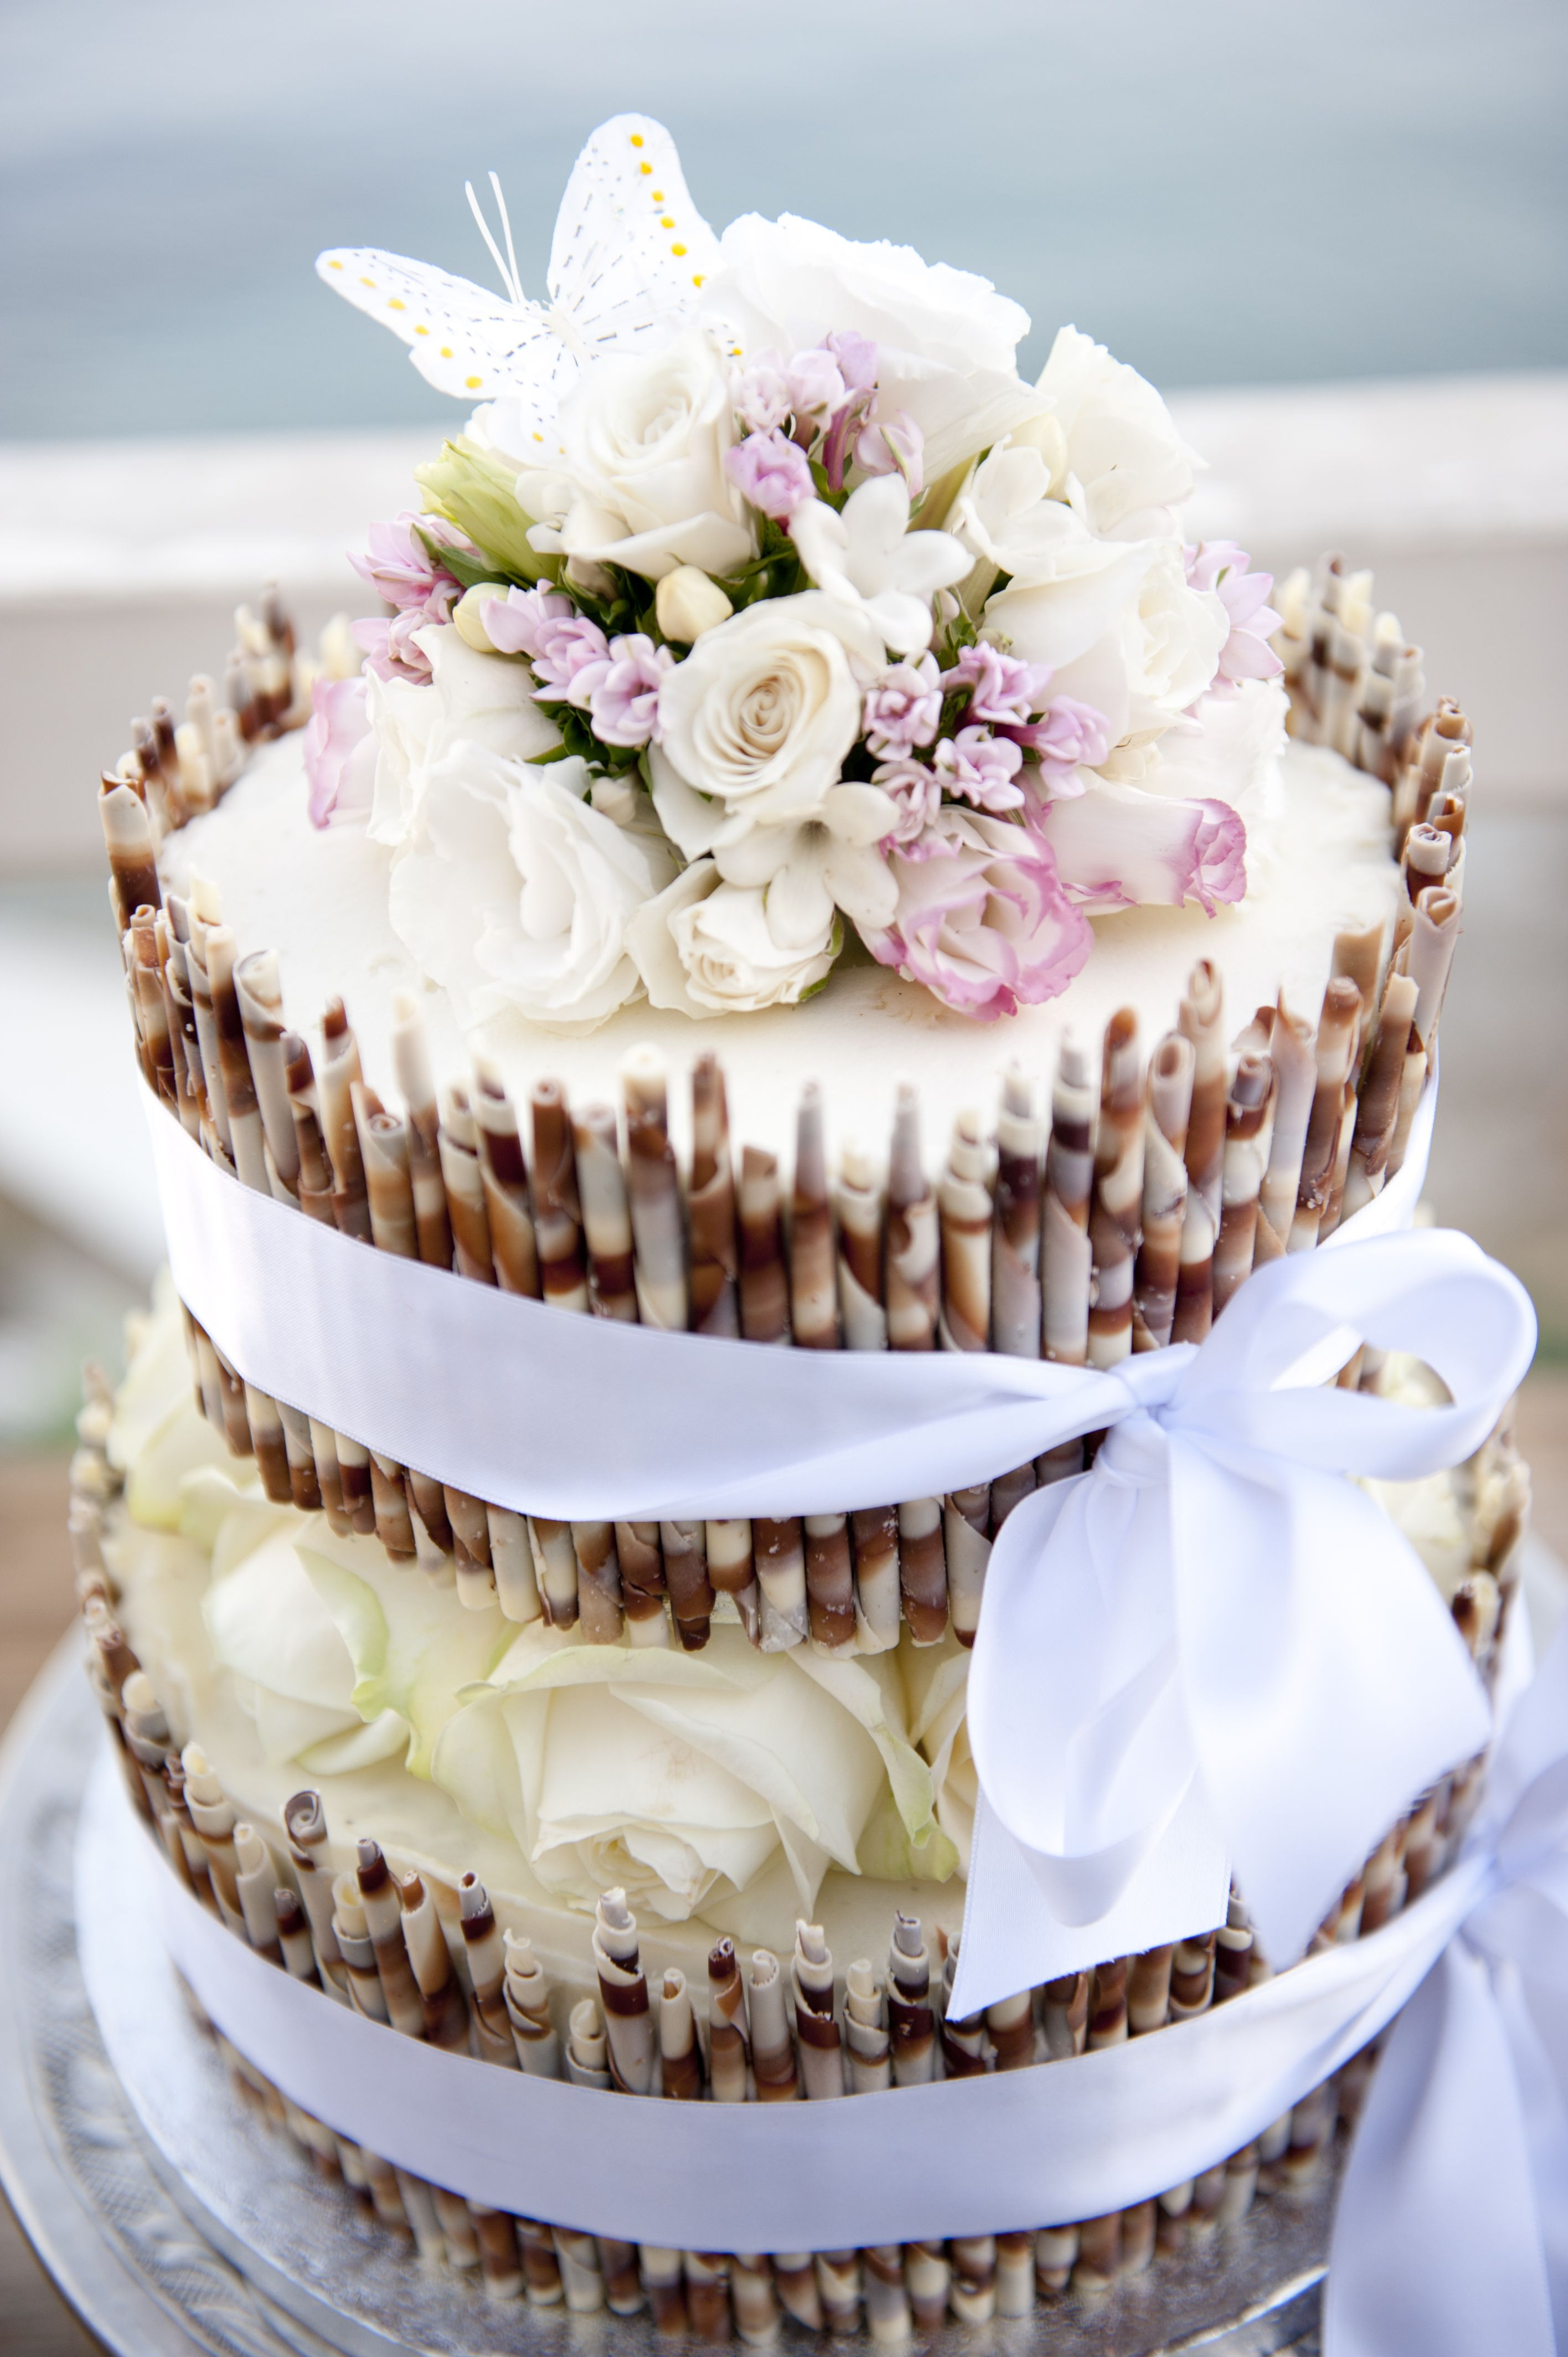 Medium Of Cheesecake Wedding Cake